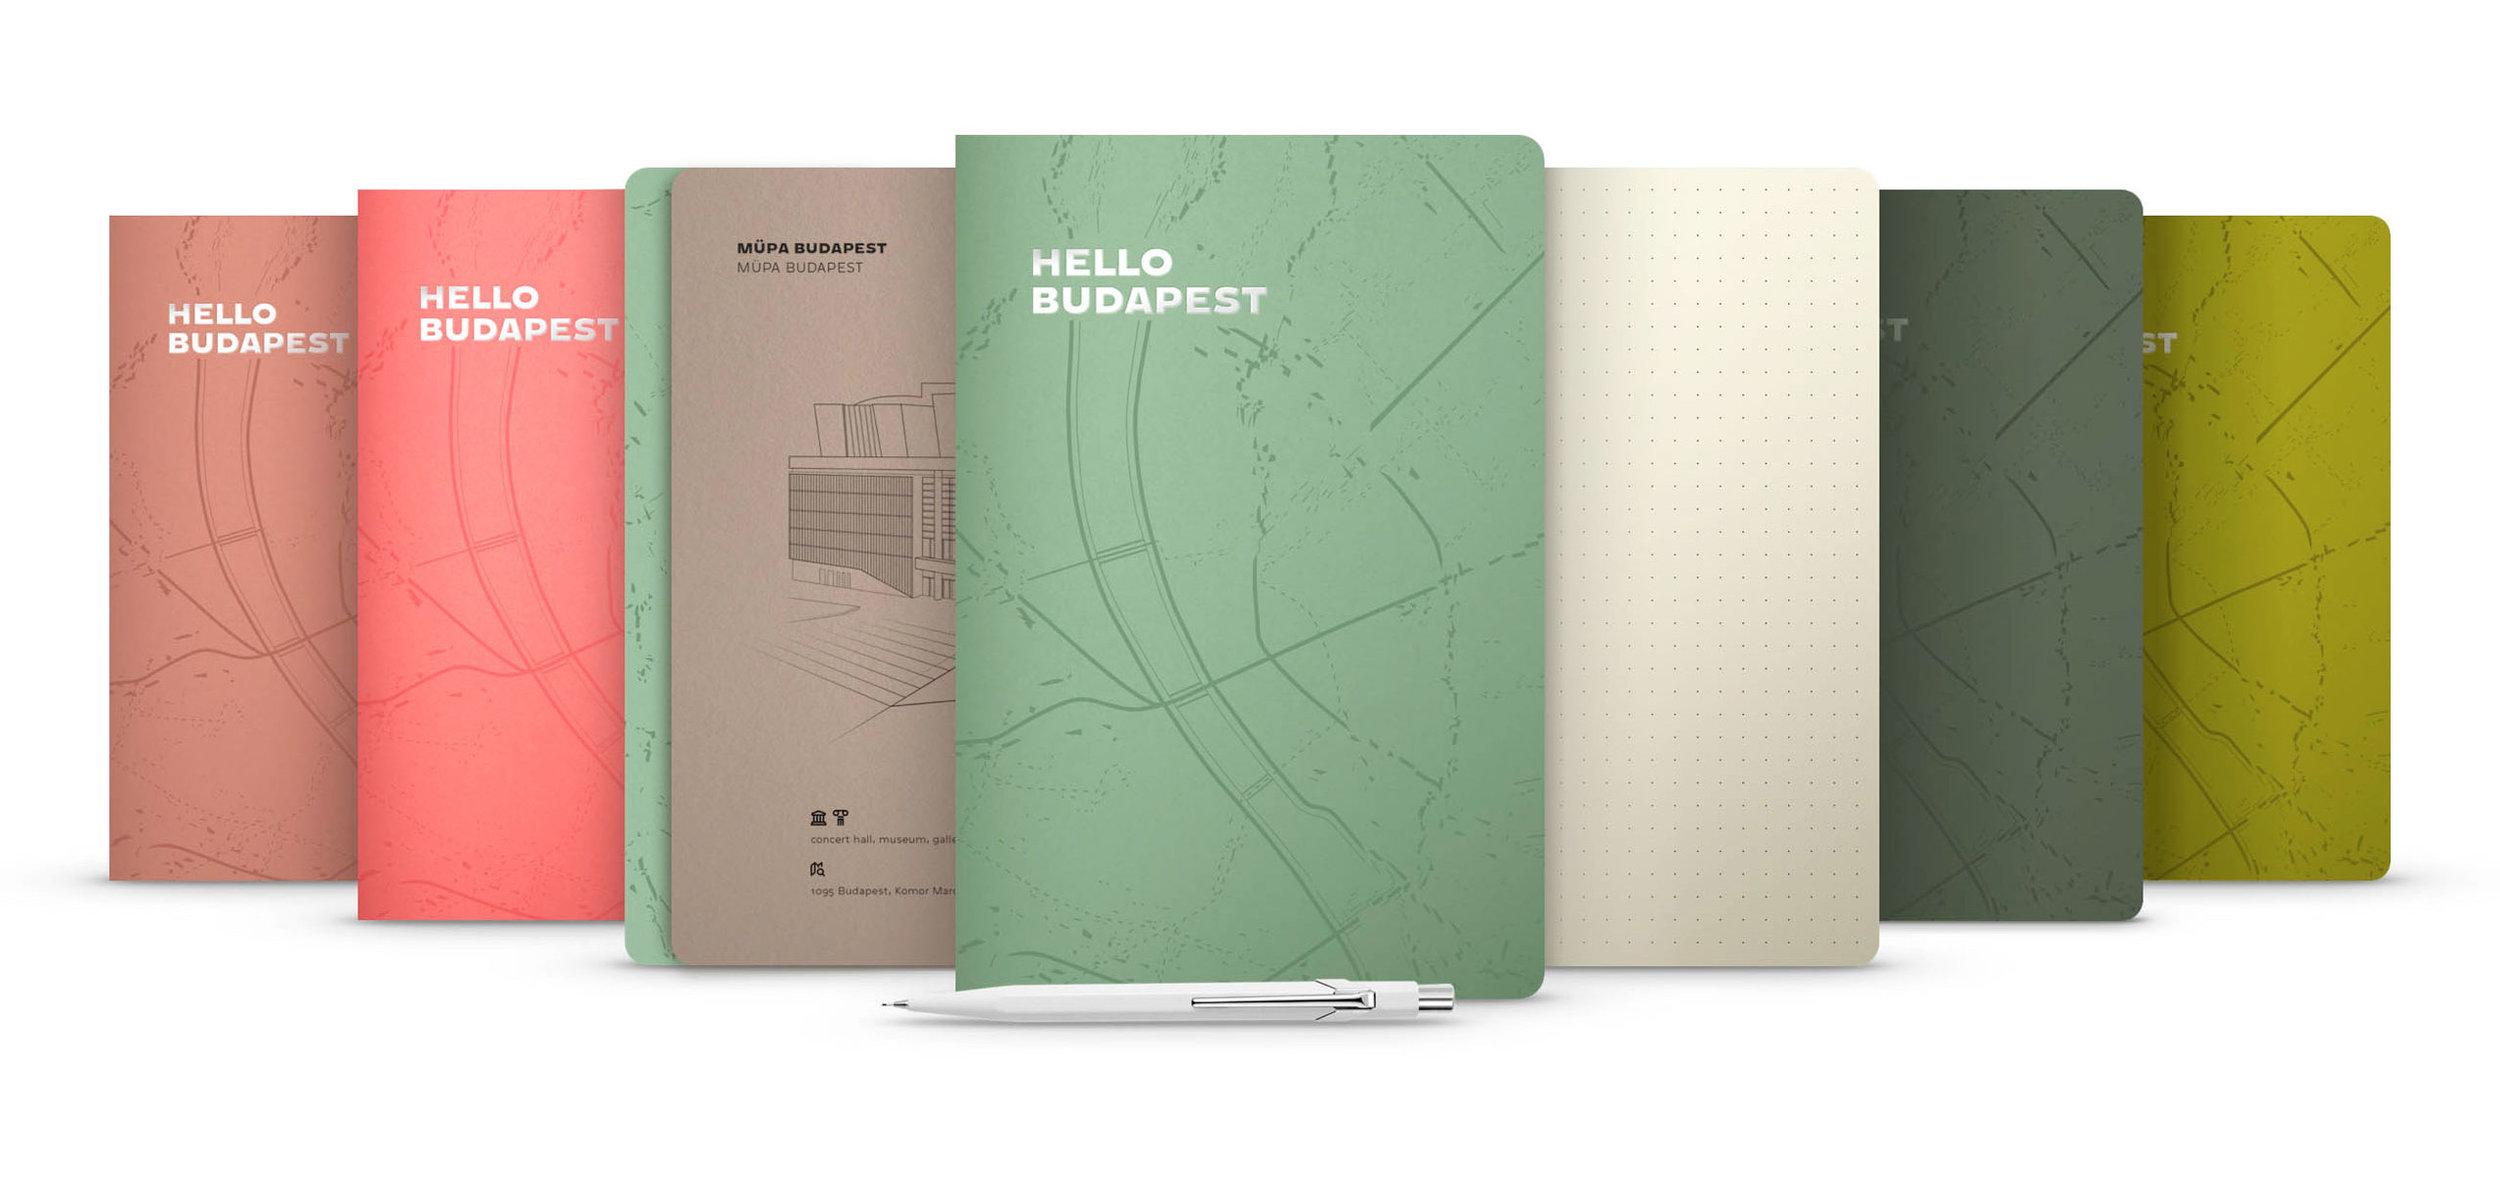 Hello Budapest eco-design notebooks